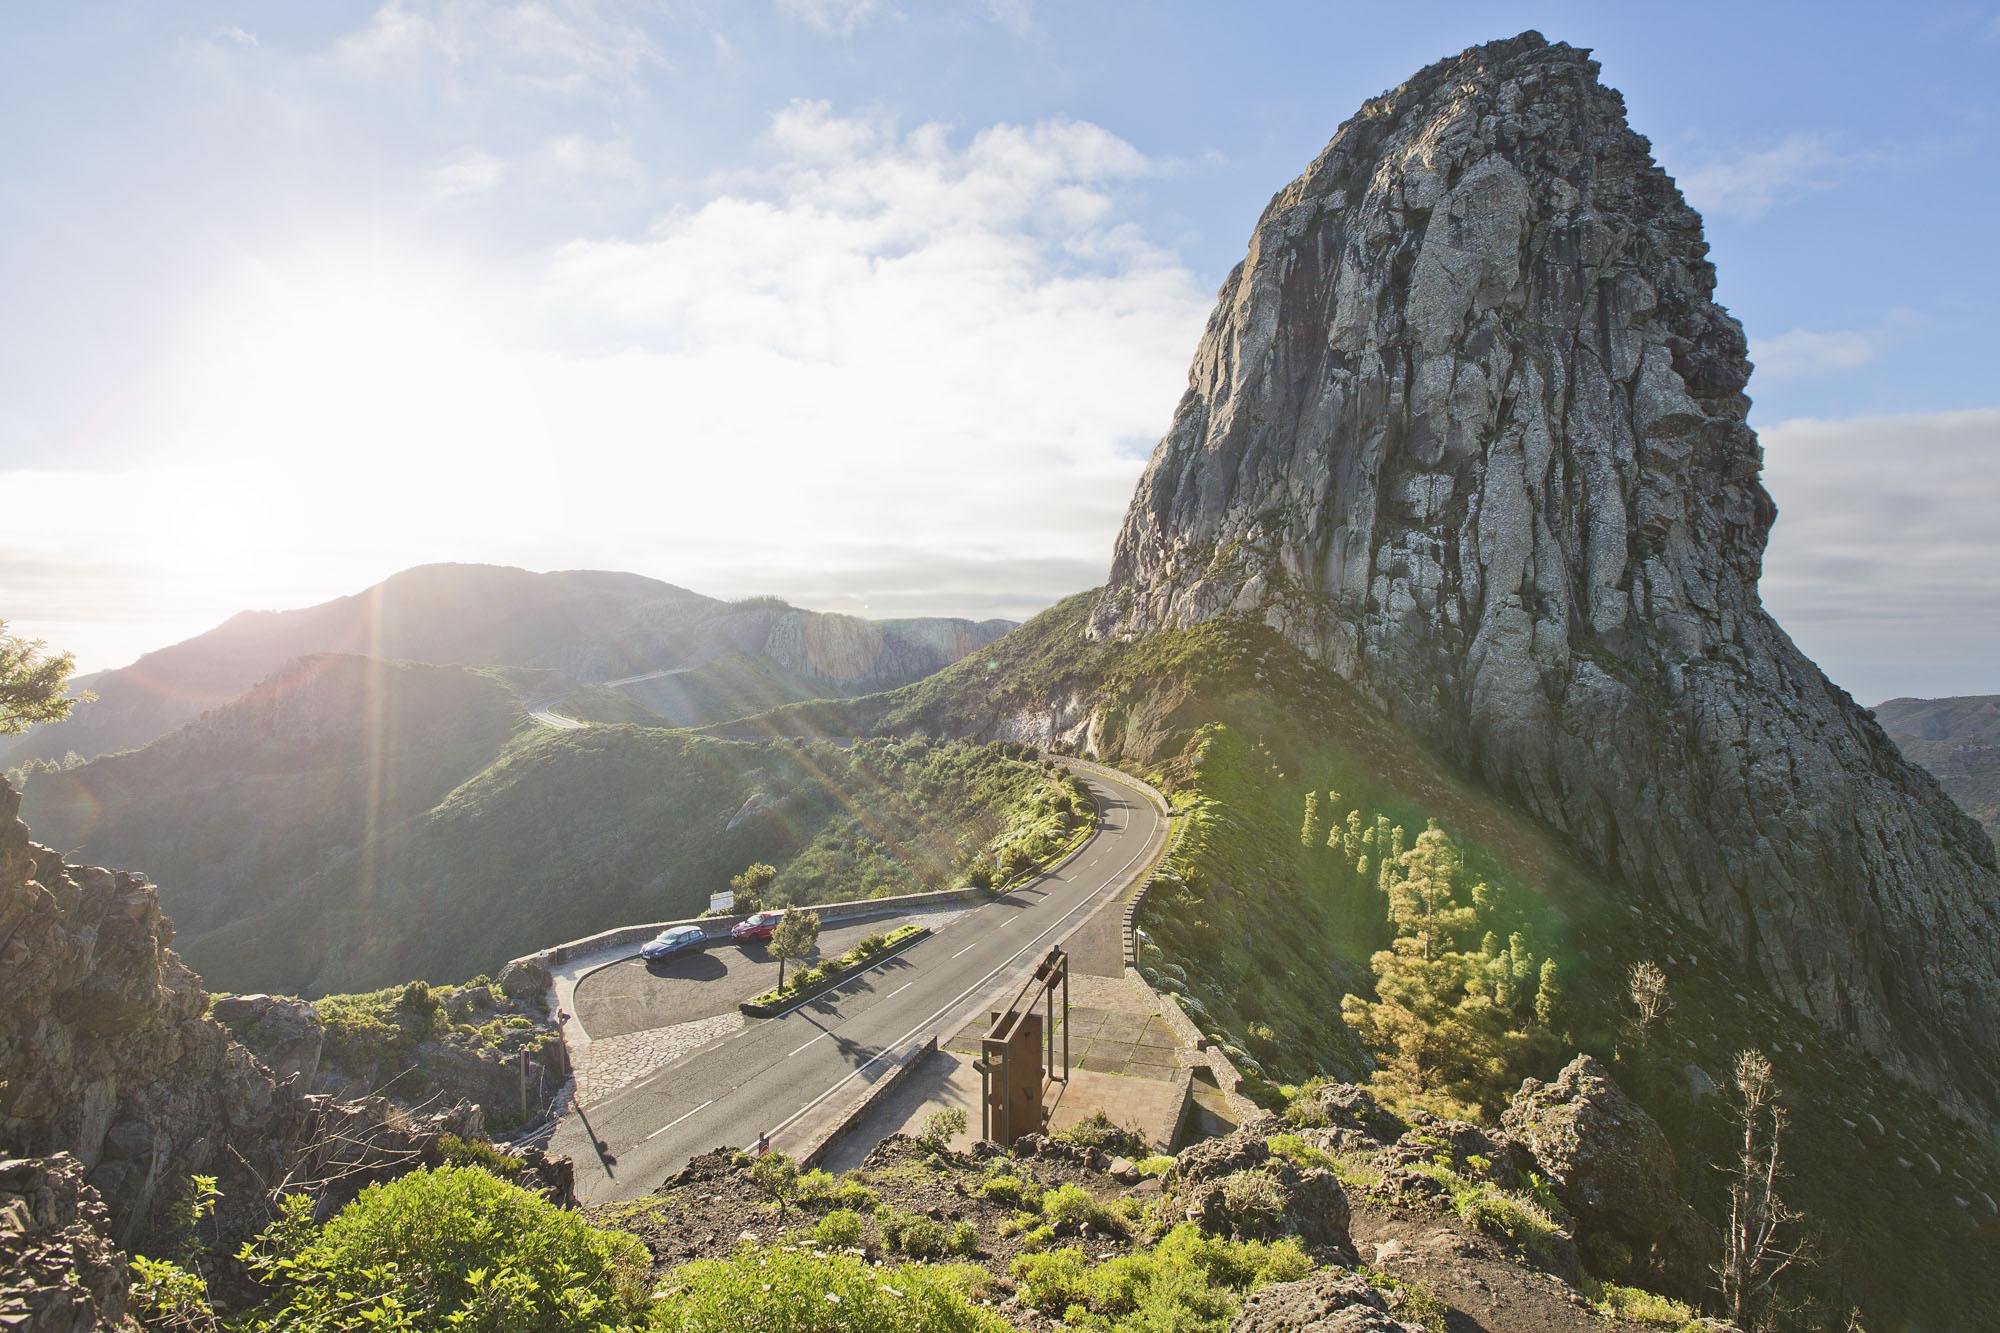 Spanien, Kanarische Inseln, La Gomera, San Sebastian de La Gomera. Aussichtspunkt Mirador El Bailadero, Nationalpark, Garajonay, Naturdenkmal Los Roques, Vulkanschlot Ojila